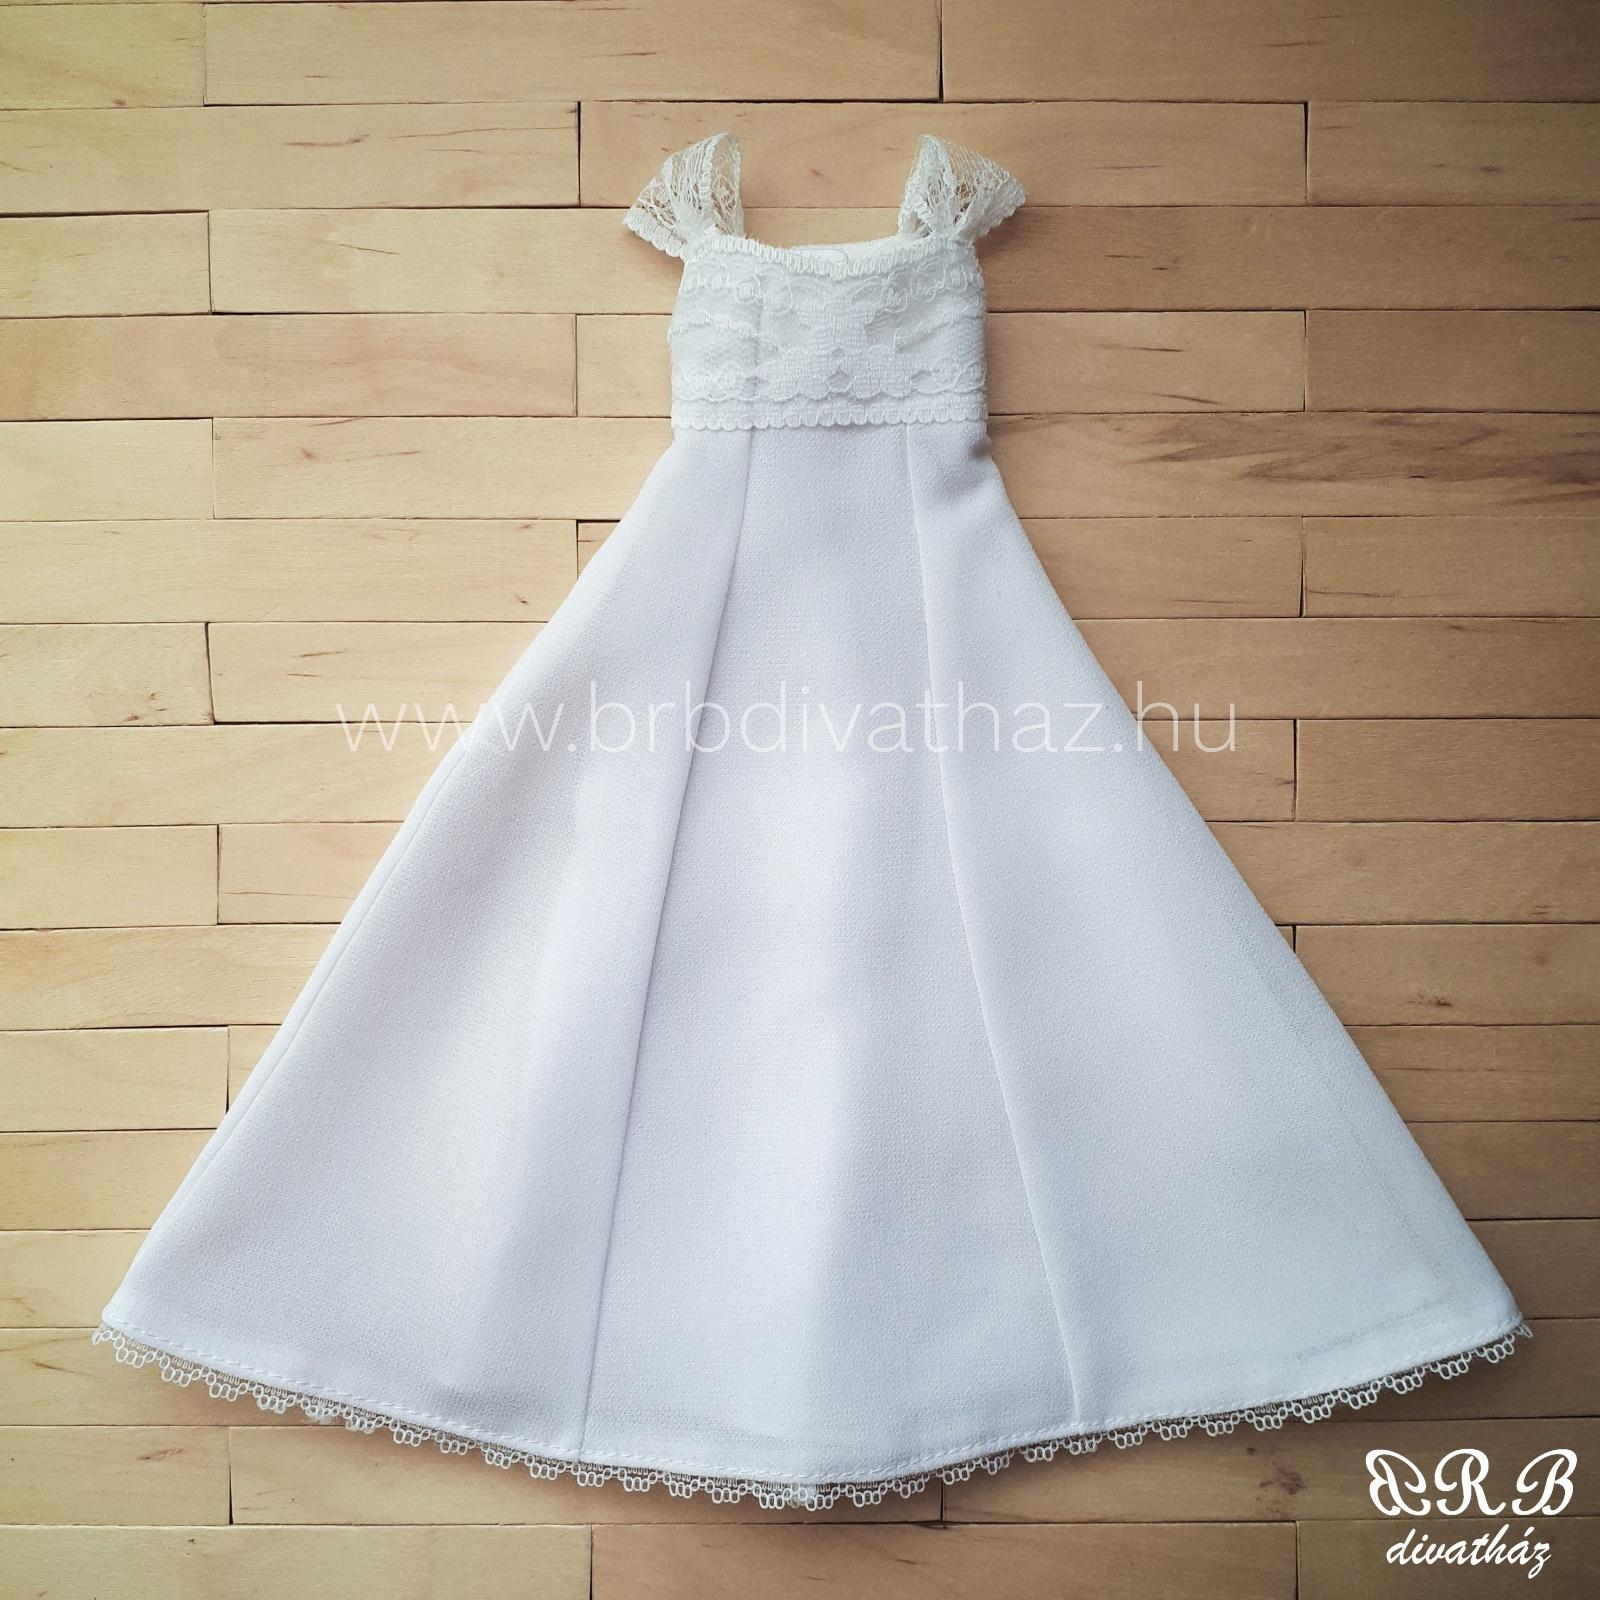 Handmade Curvy Barbie wedding dress – BRB divathaz